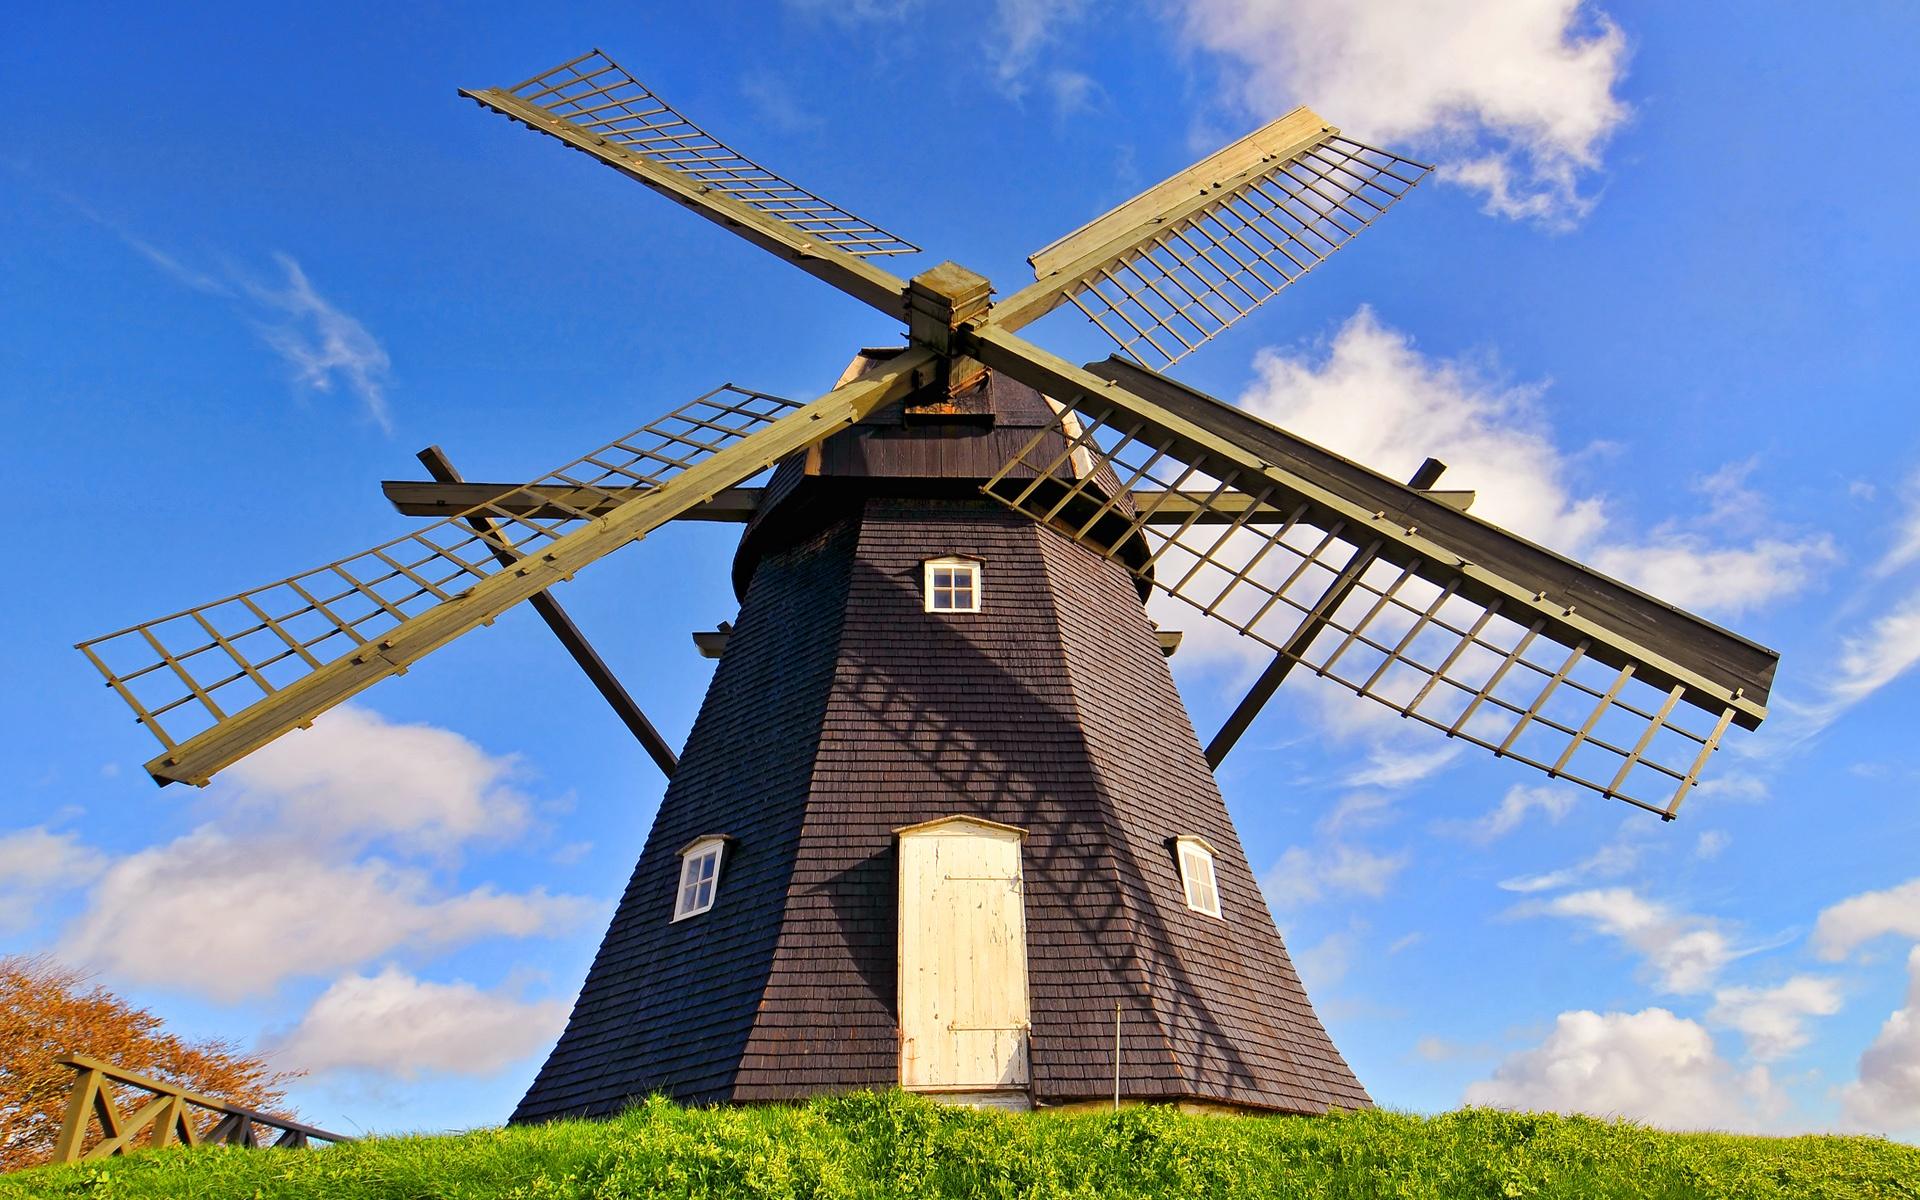 Windmill; Windmill Pictures; Windmill Pictures ...